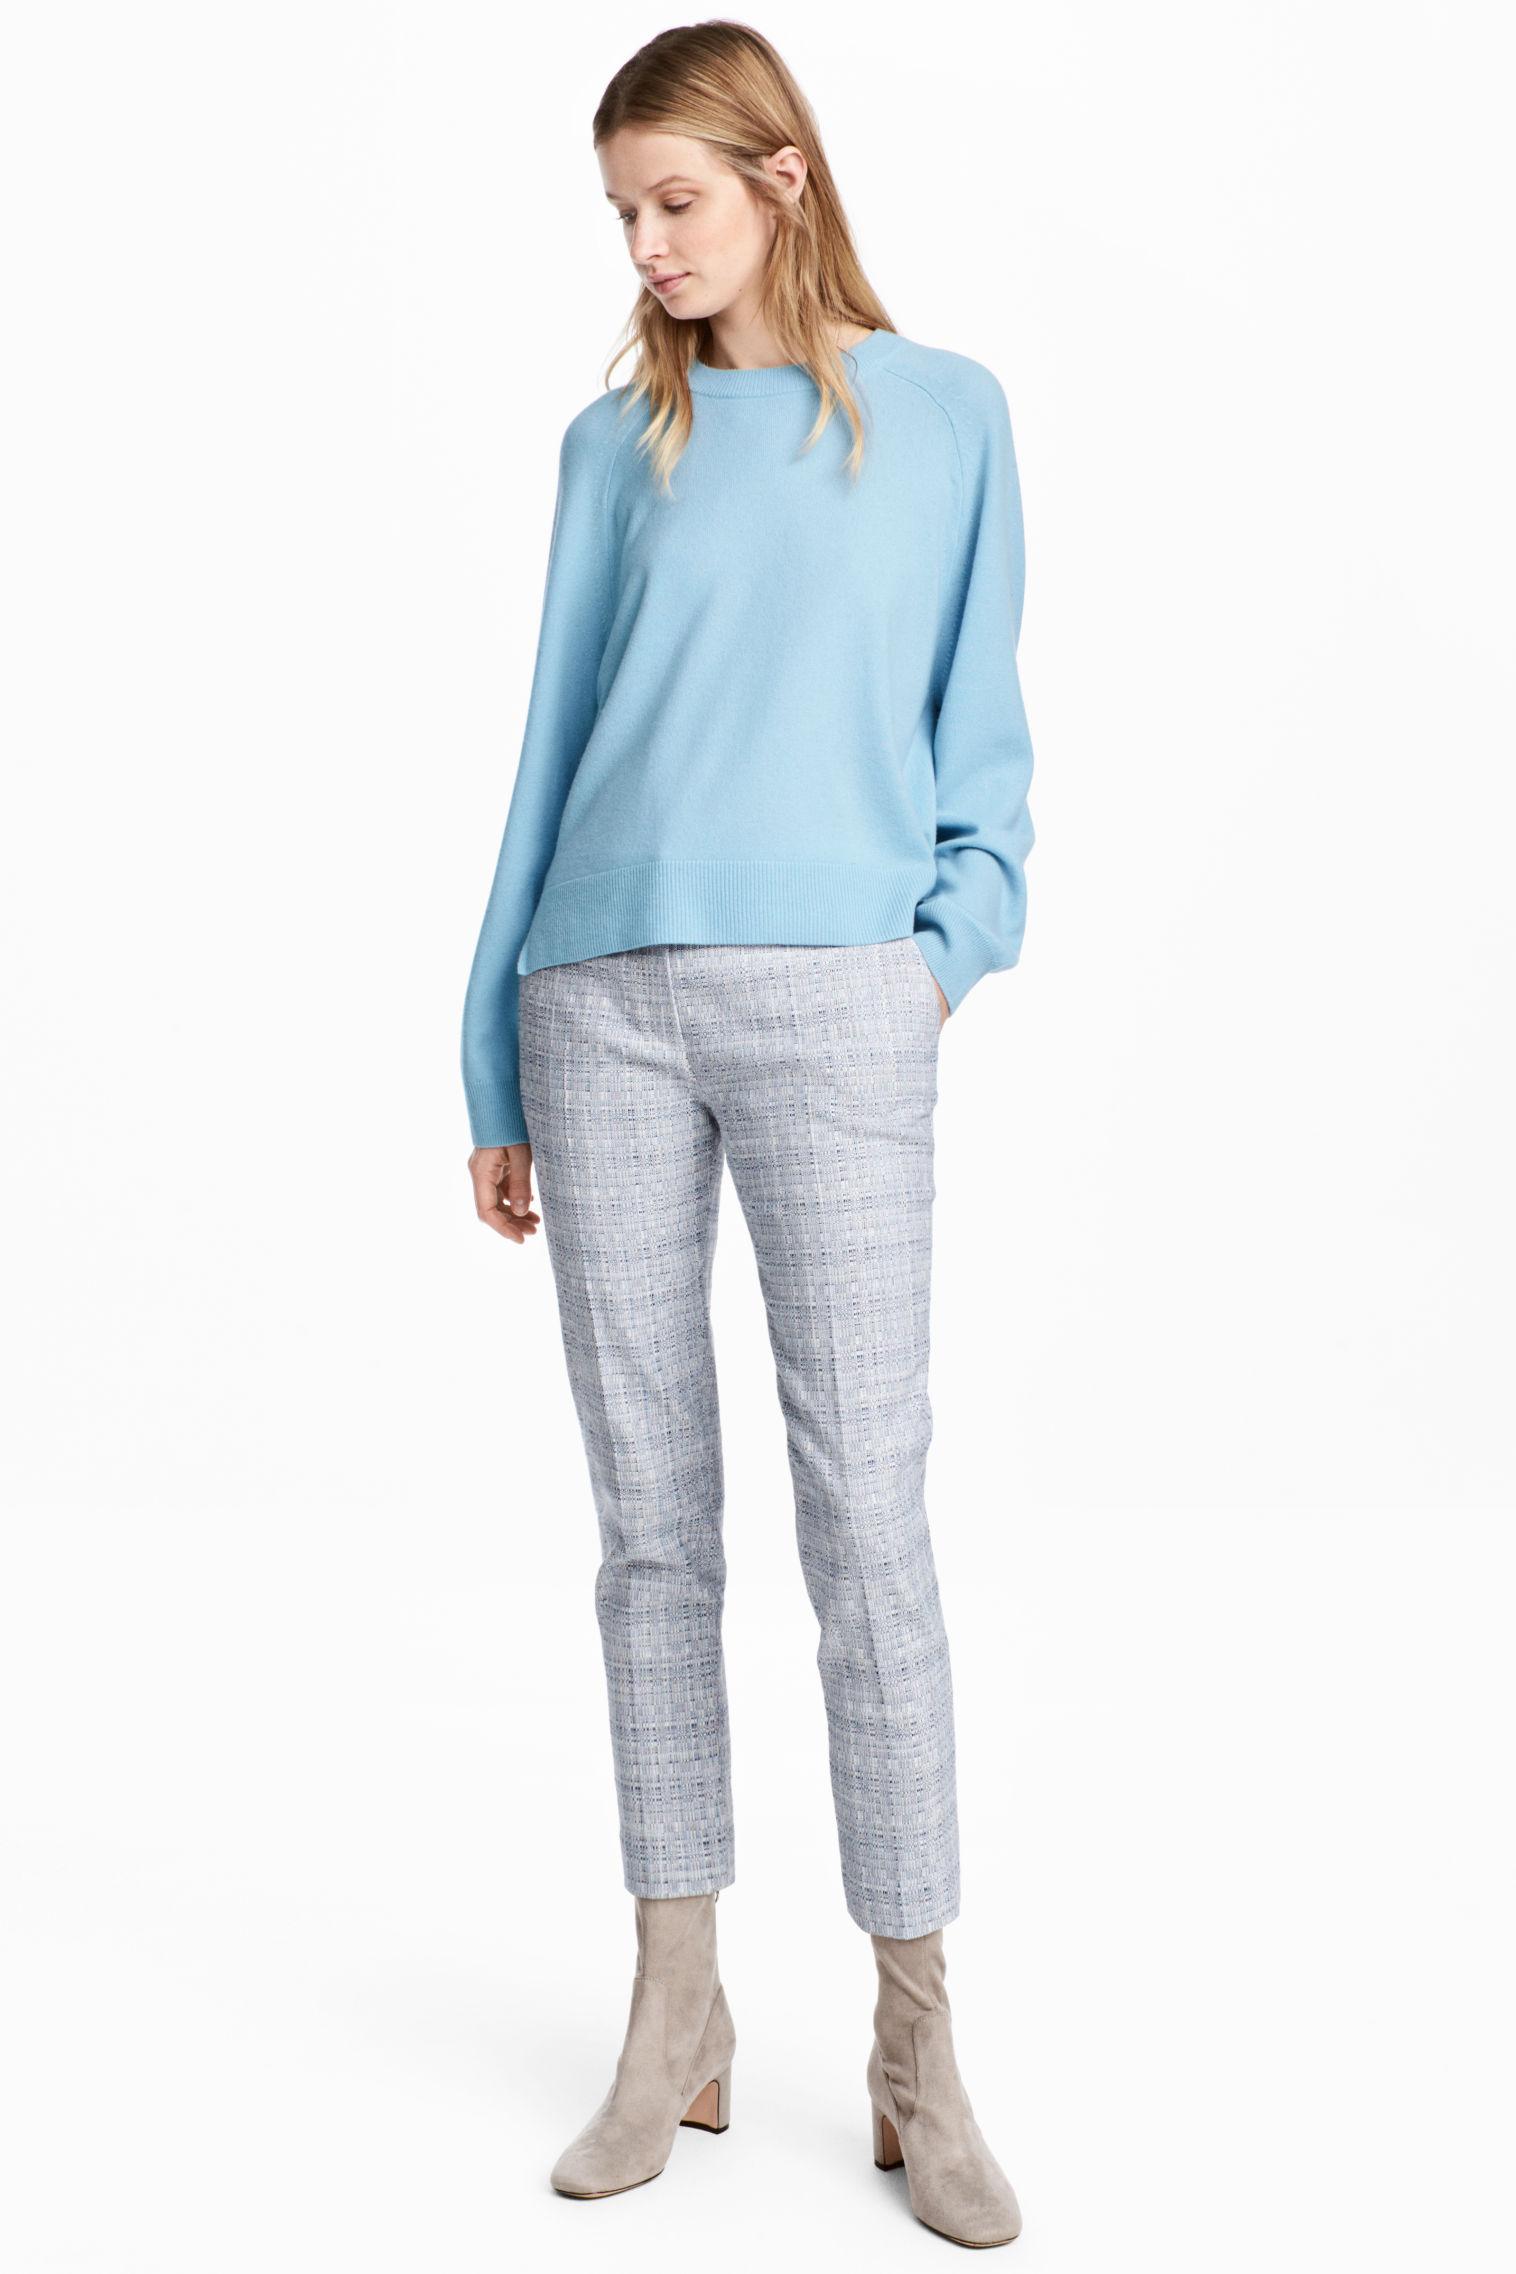 Pantaloni eleganti grigi H&M collezione primavera estate 2018